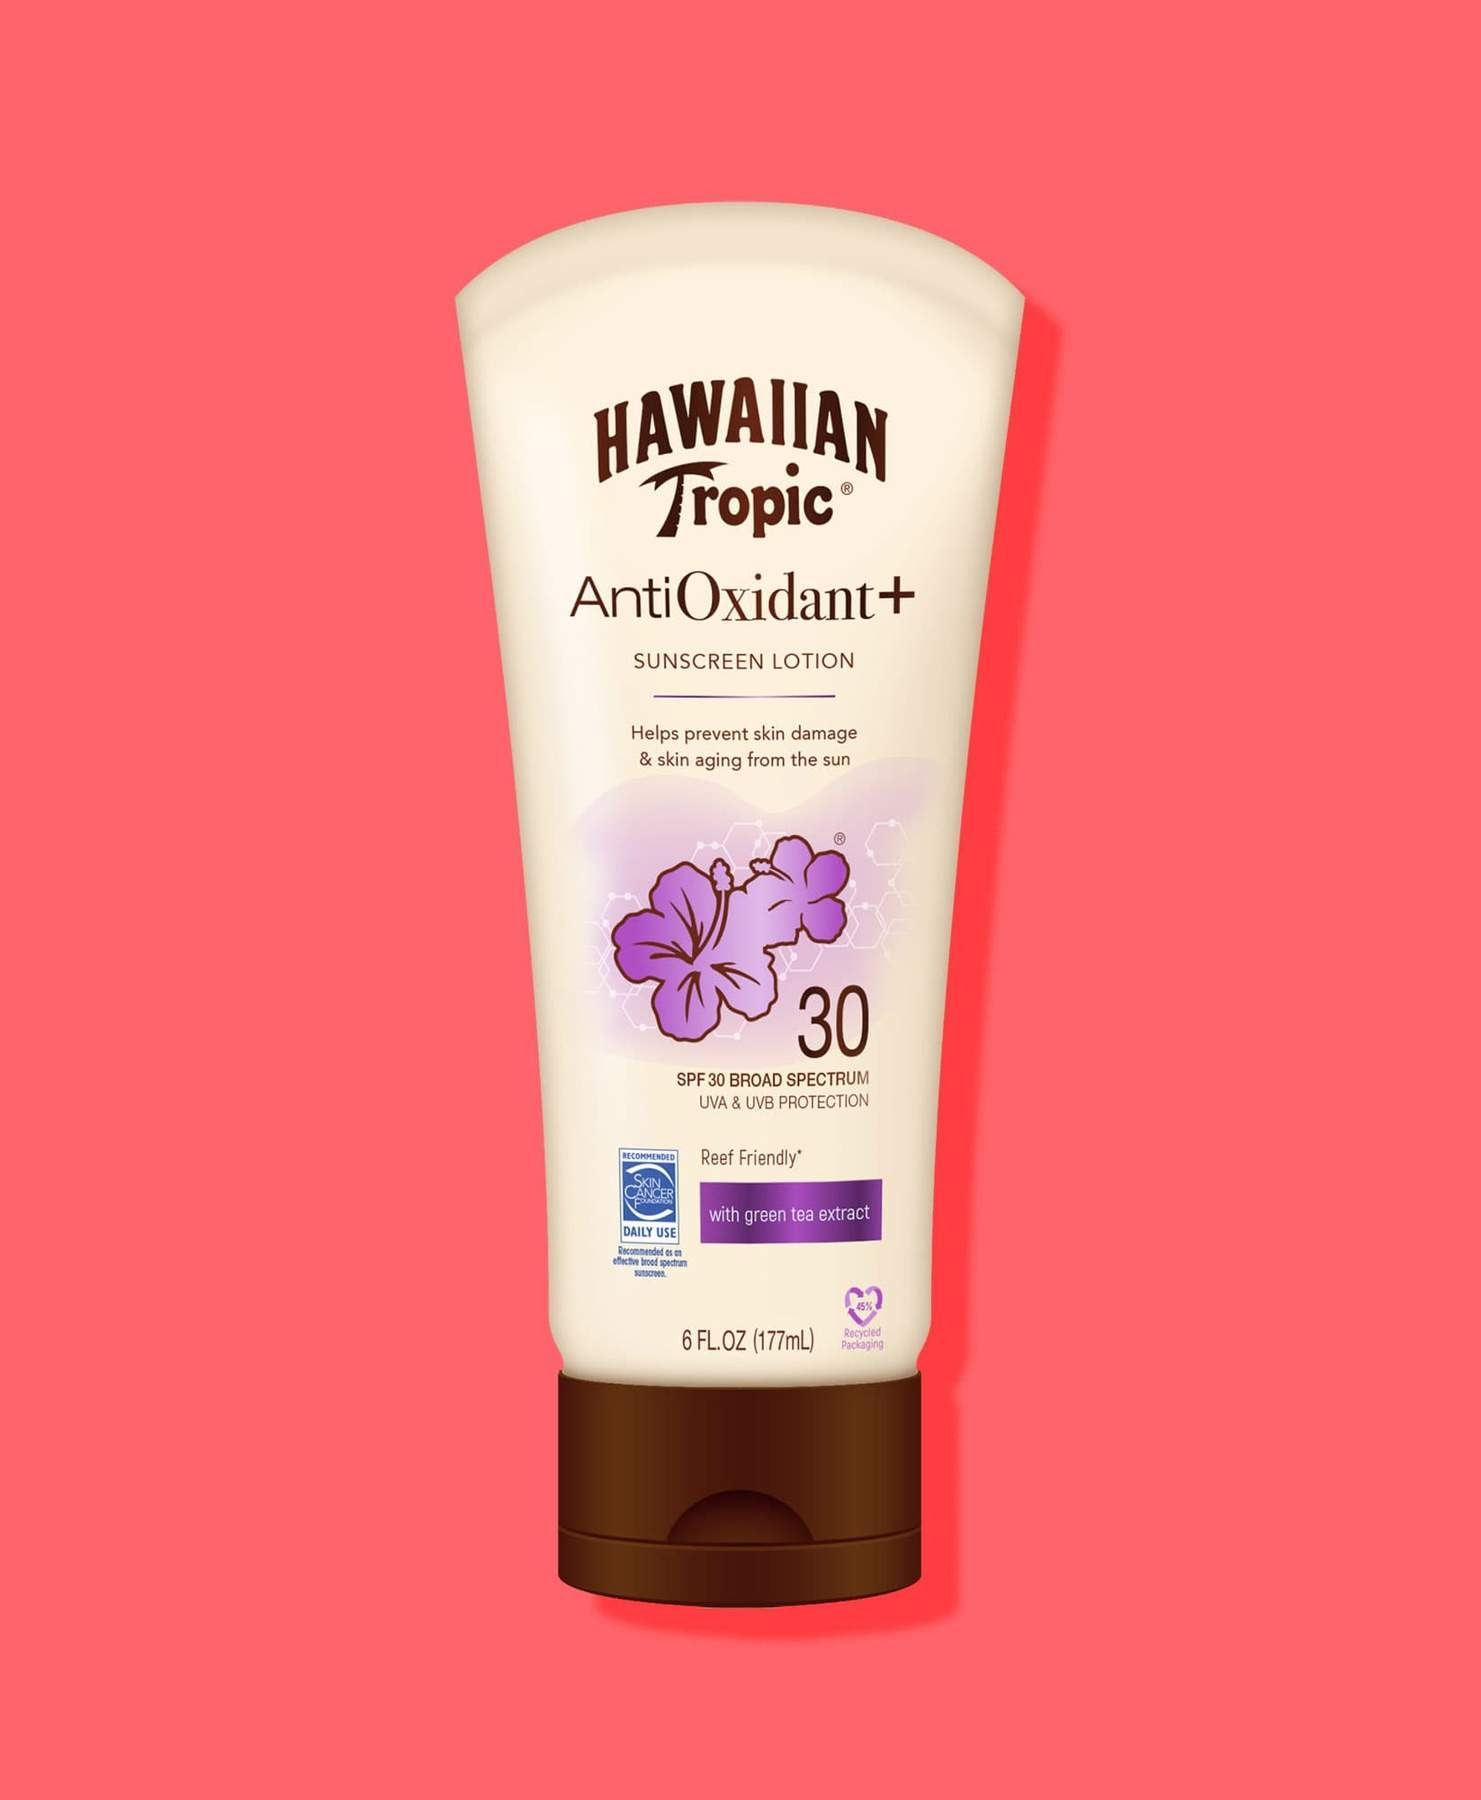 Hawaiian Tropic AntiOxidant Sunscreen lotion. Image courtesy of Hawaiian Tropic.